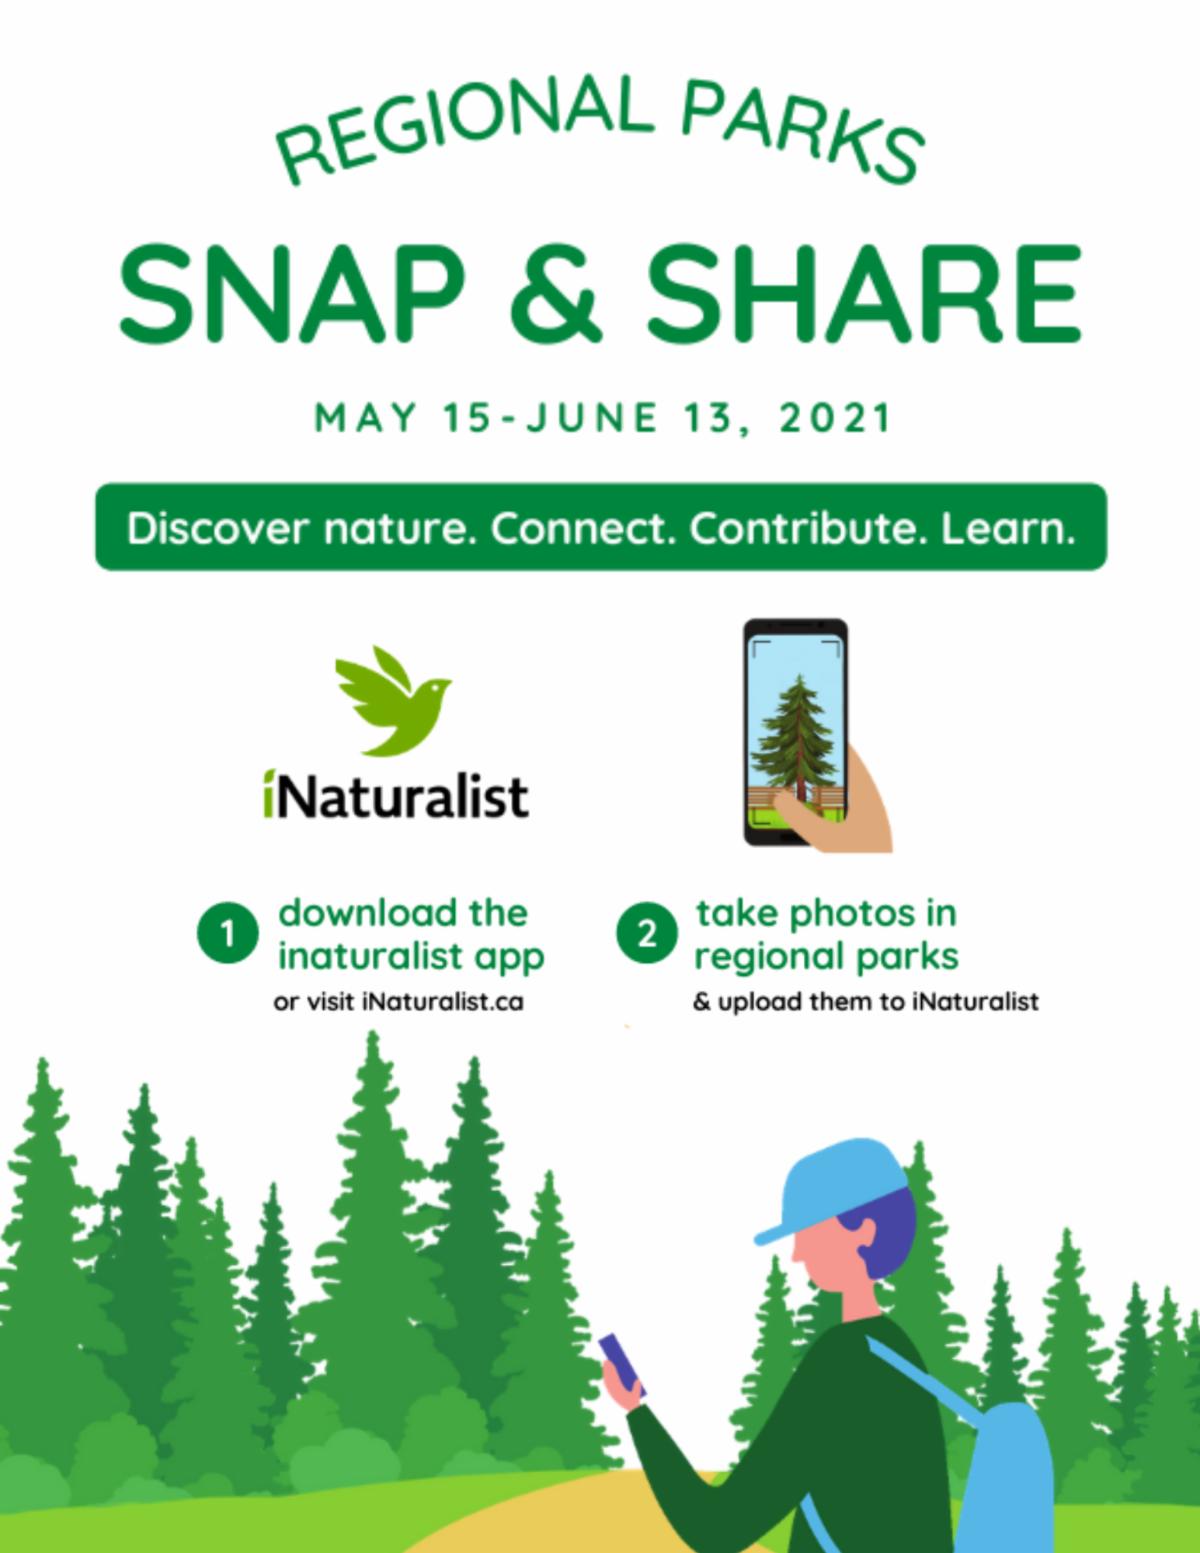 Regional Parks Snap & Share